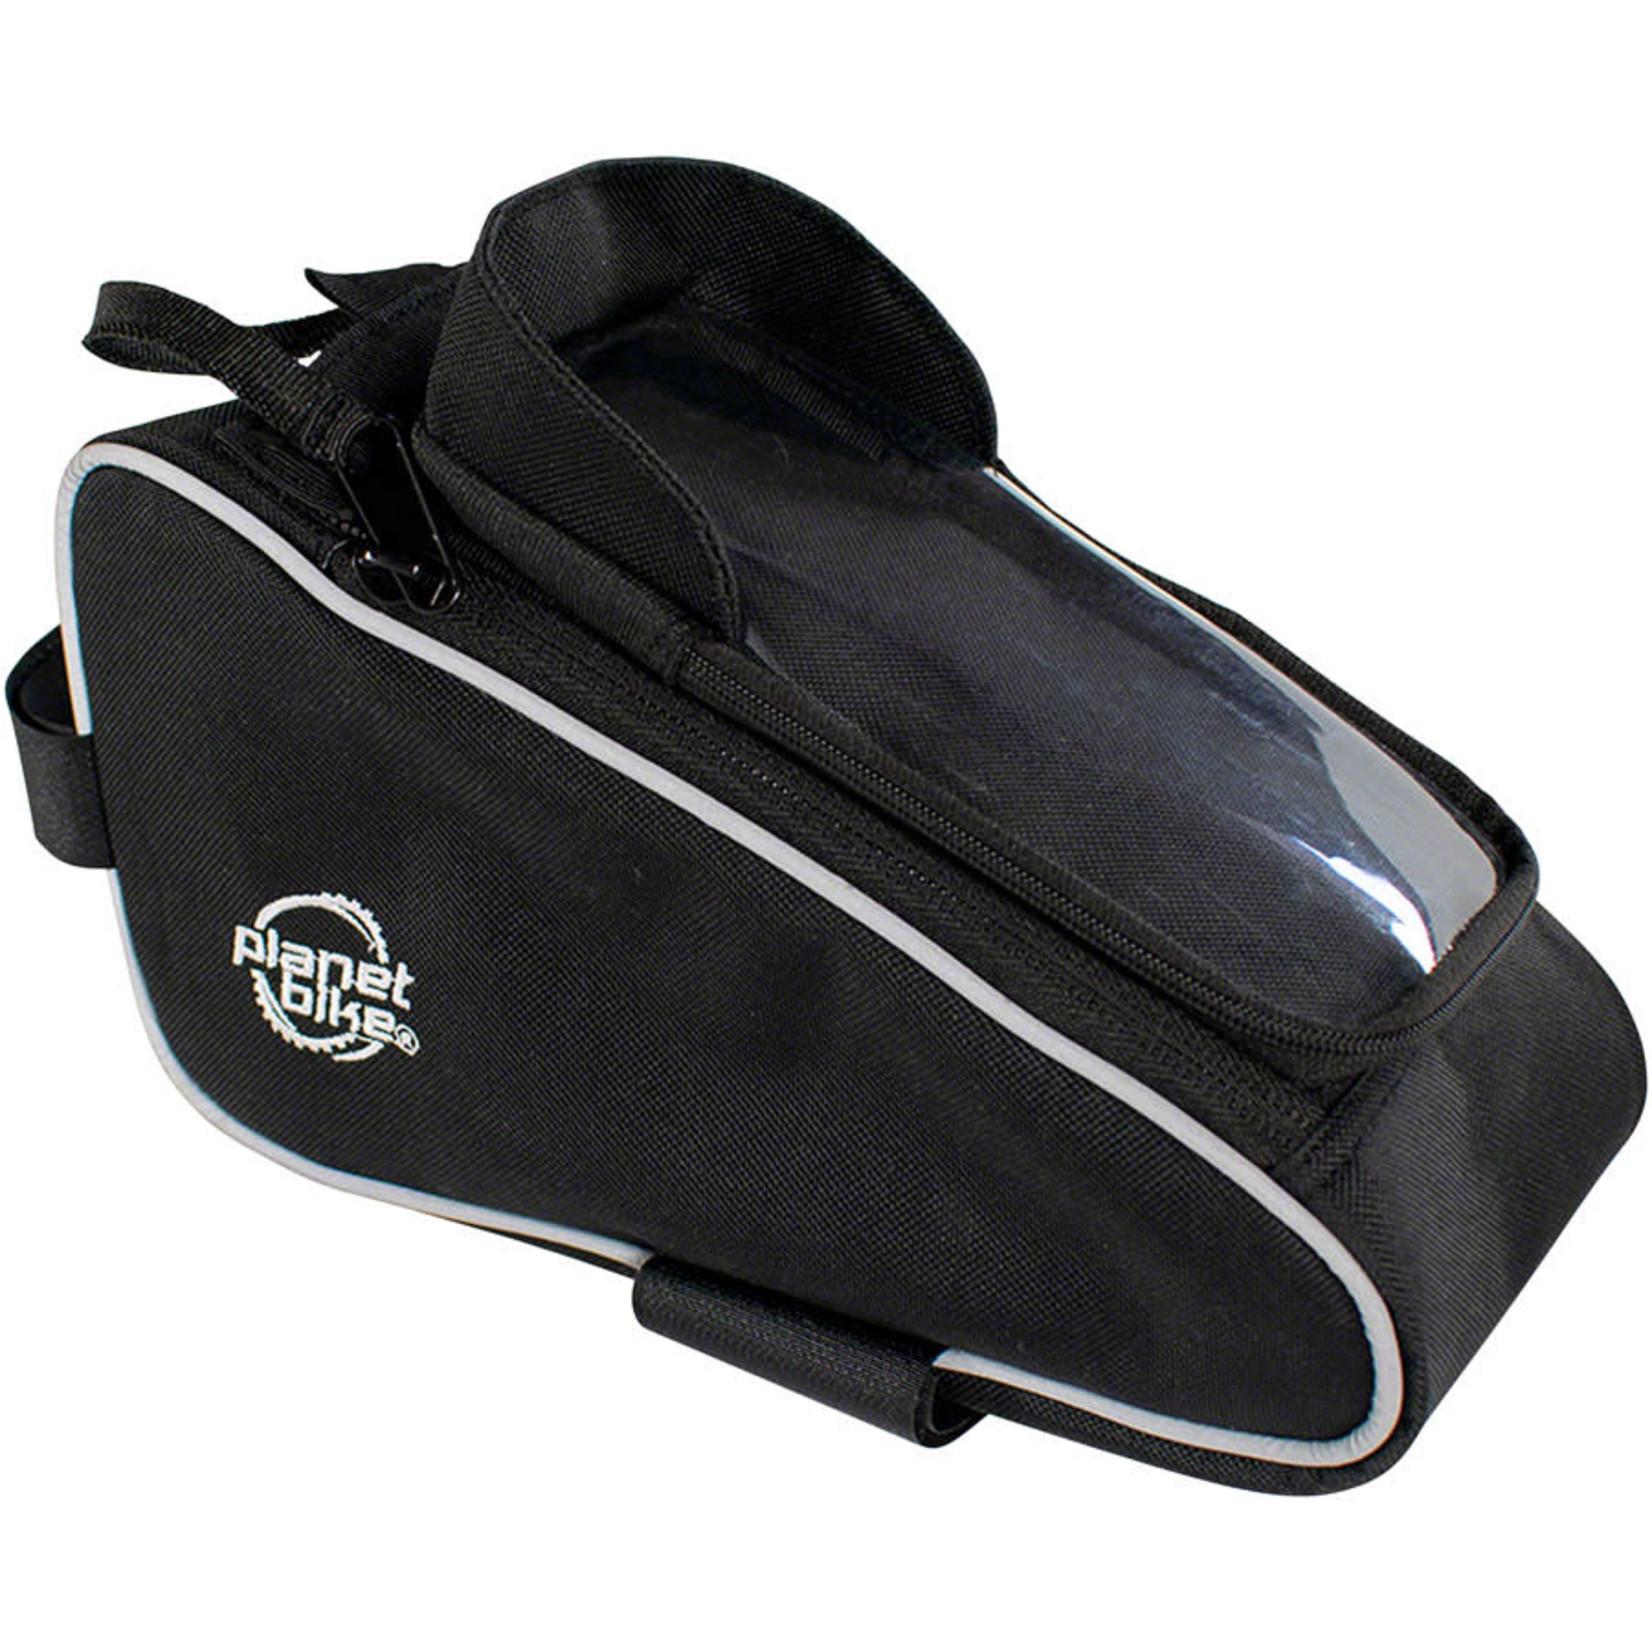 Planet Bike Planet Bike Lunch Box Top Tube/Stem Bag - 74 Cu In, Black